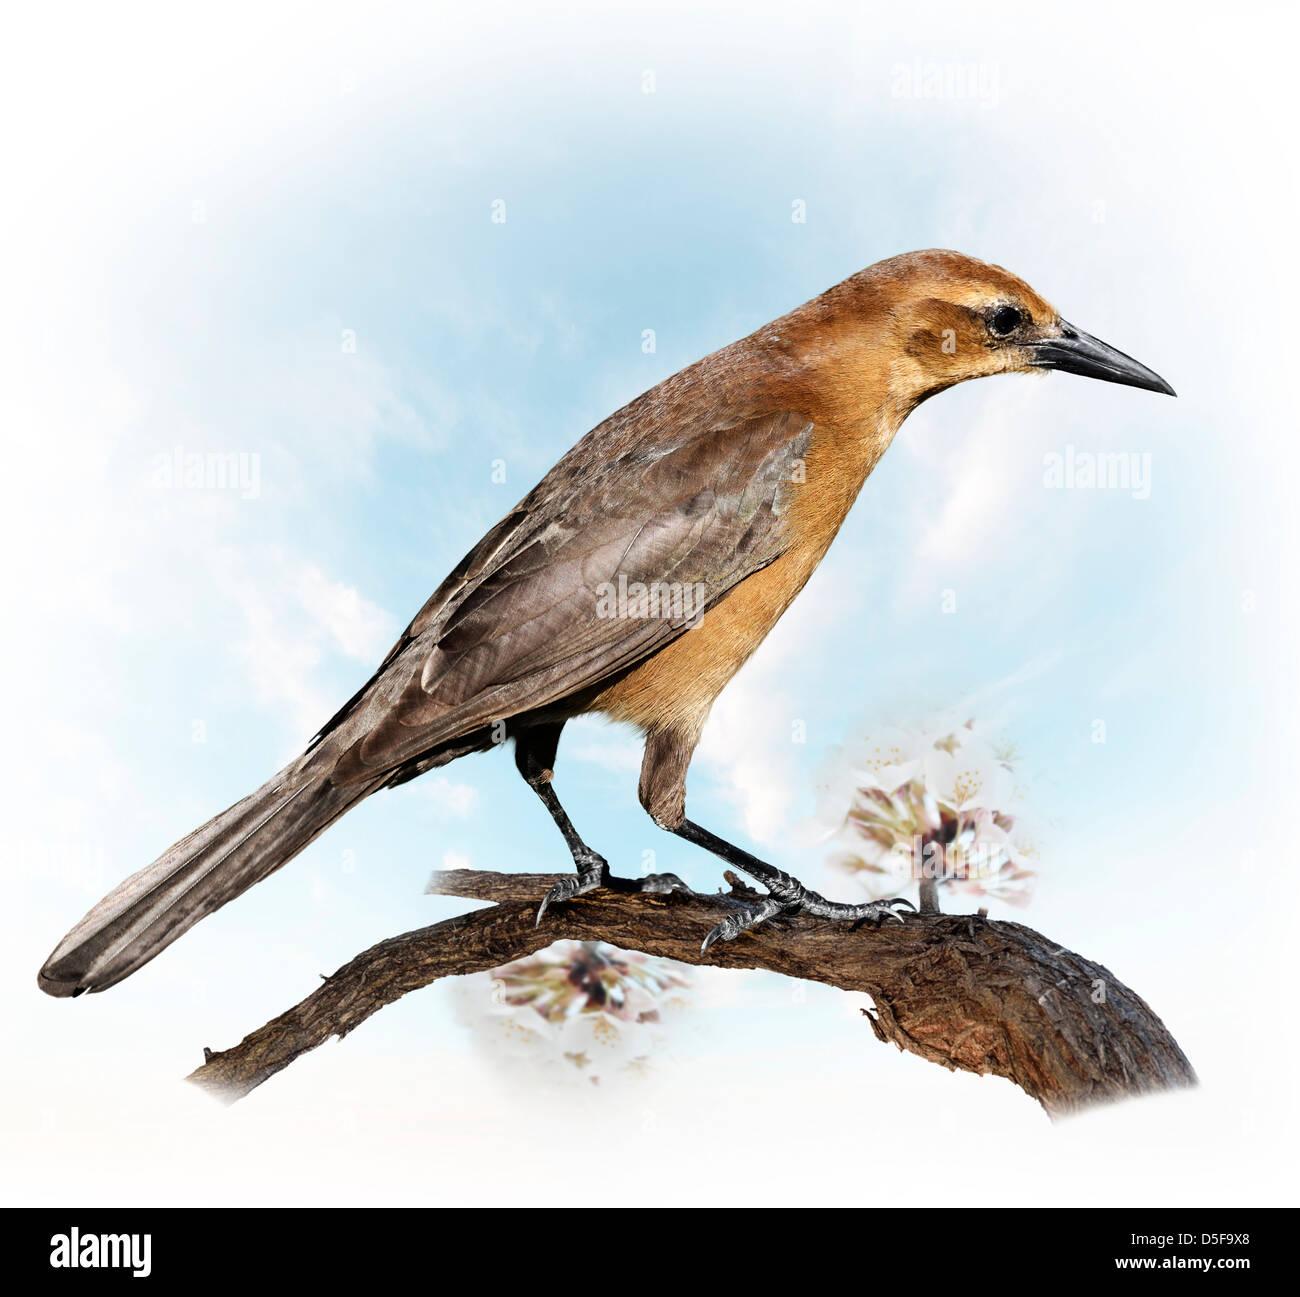 A Bird Perching On A Apple Branch (female blackbird (turdus merula) - Stock Image